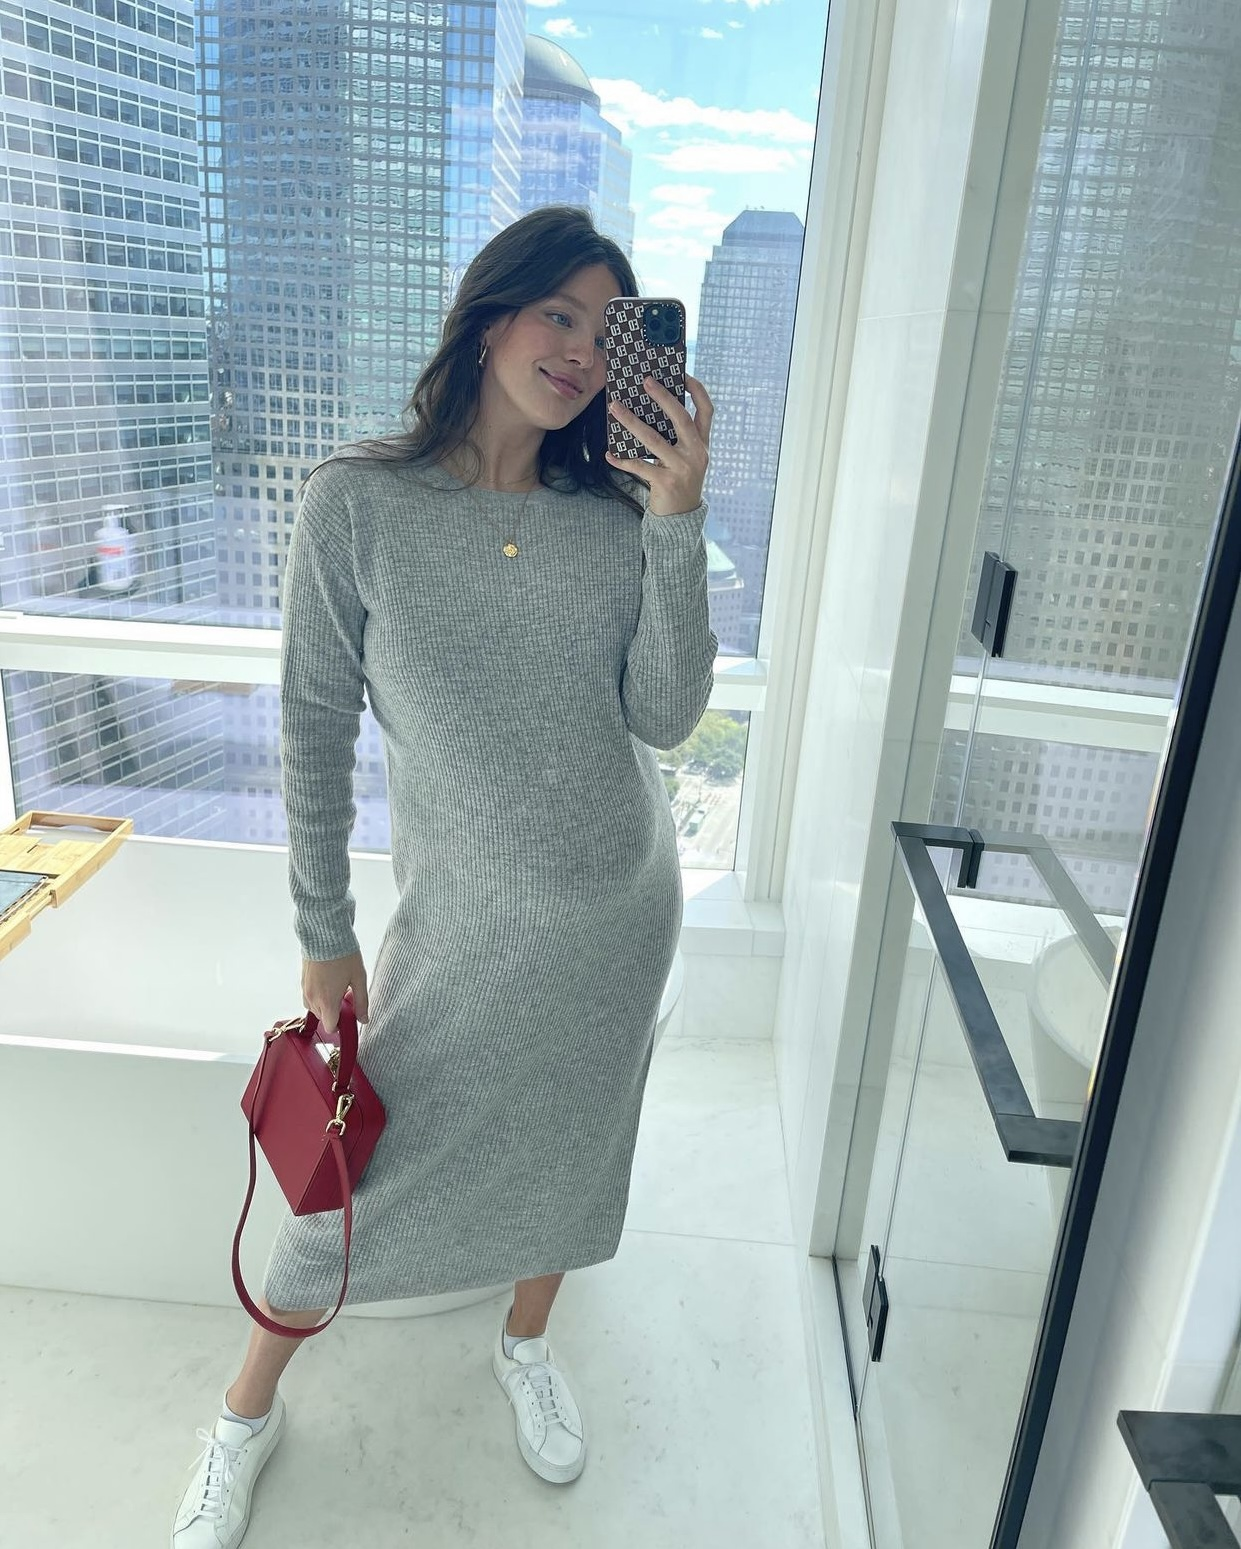 Emily Didonato's maternity look